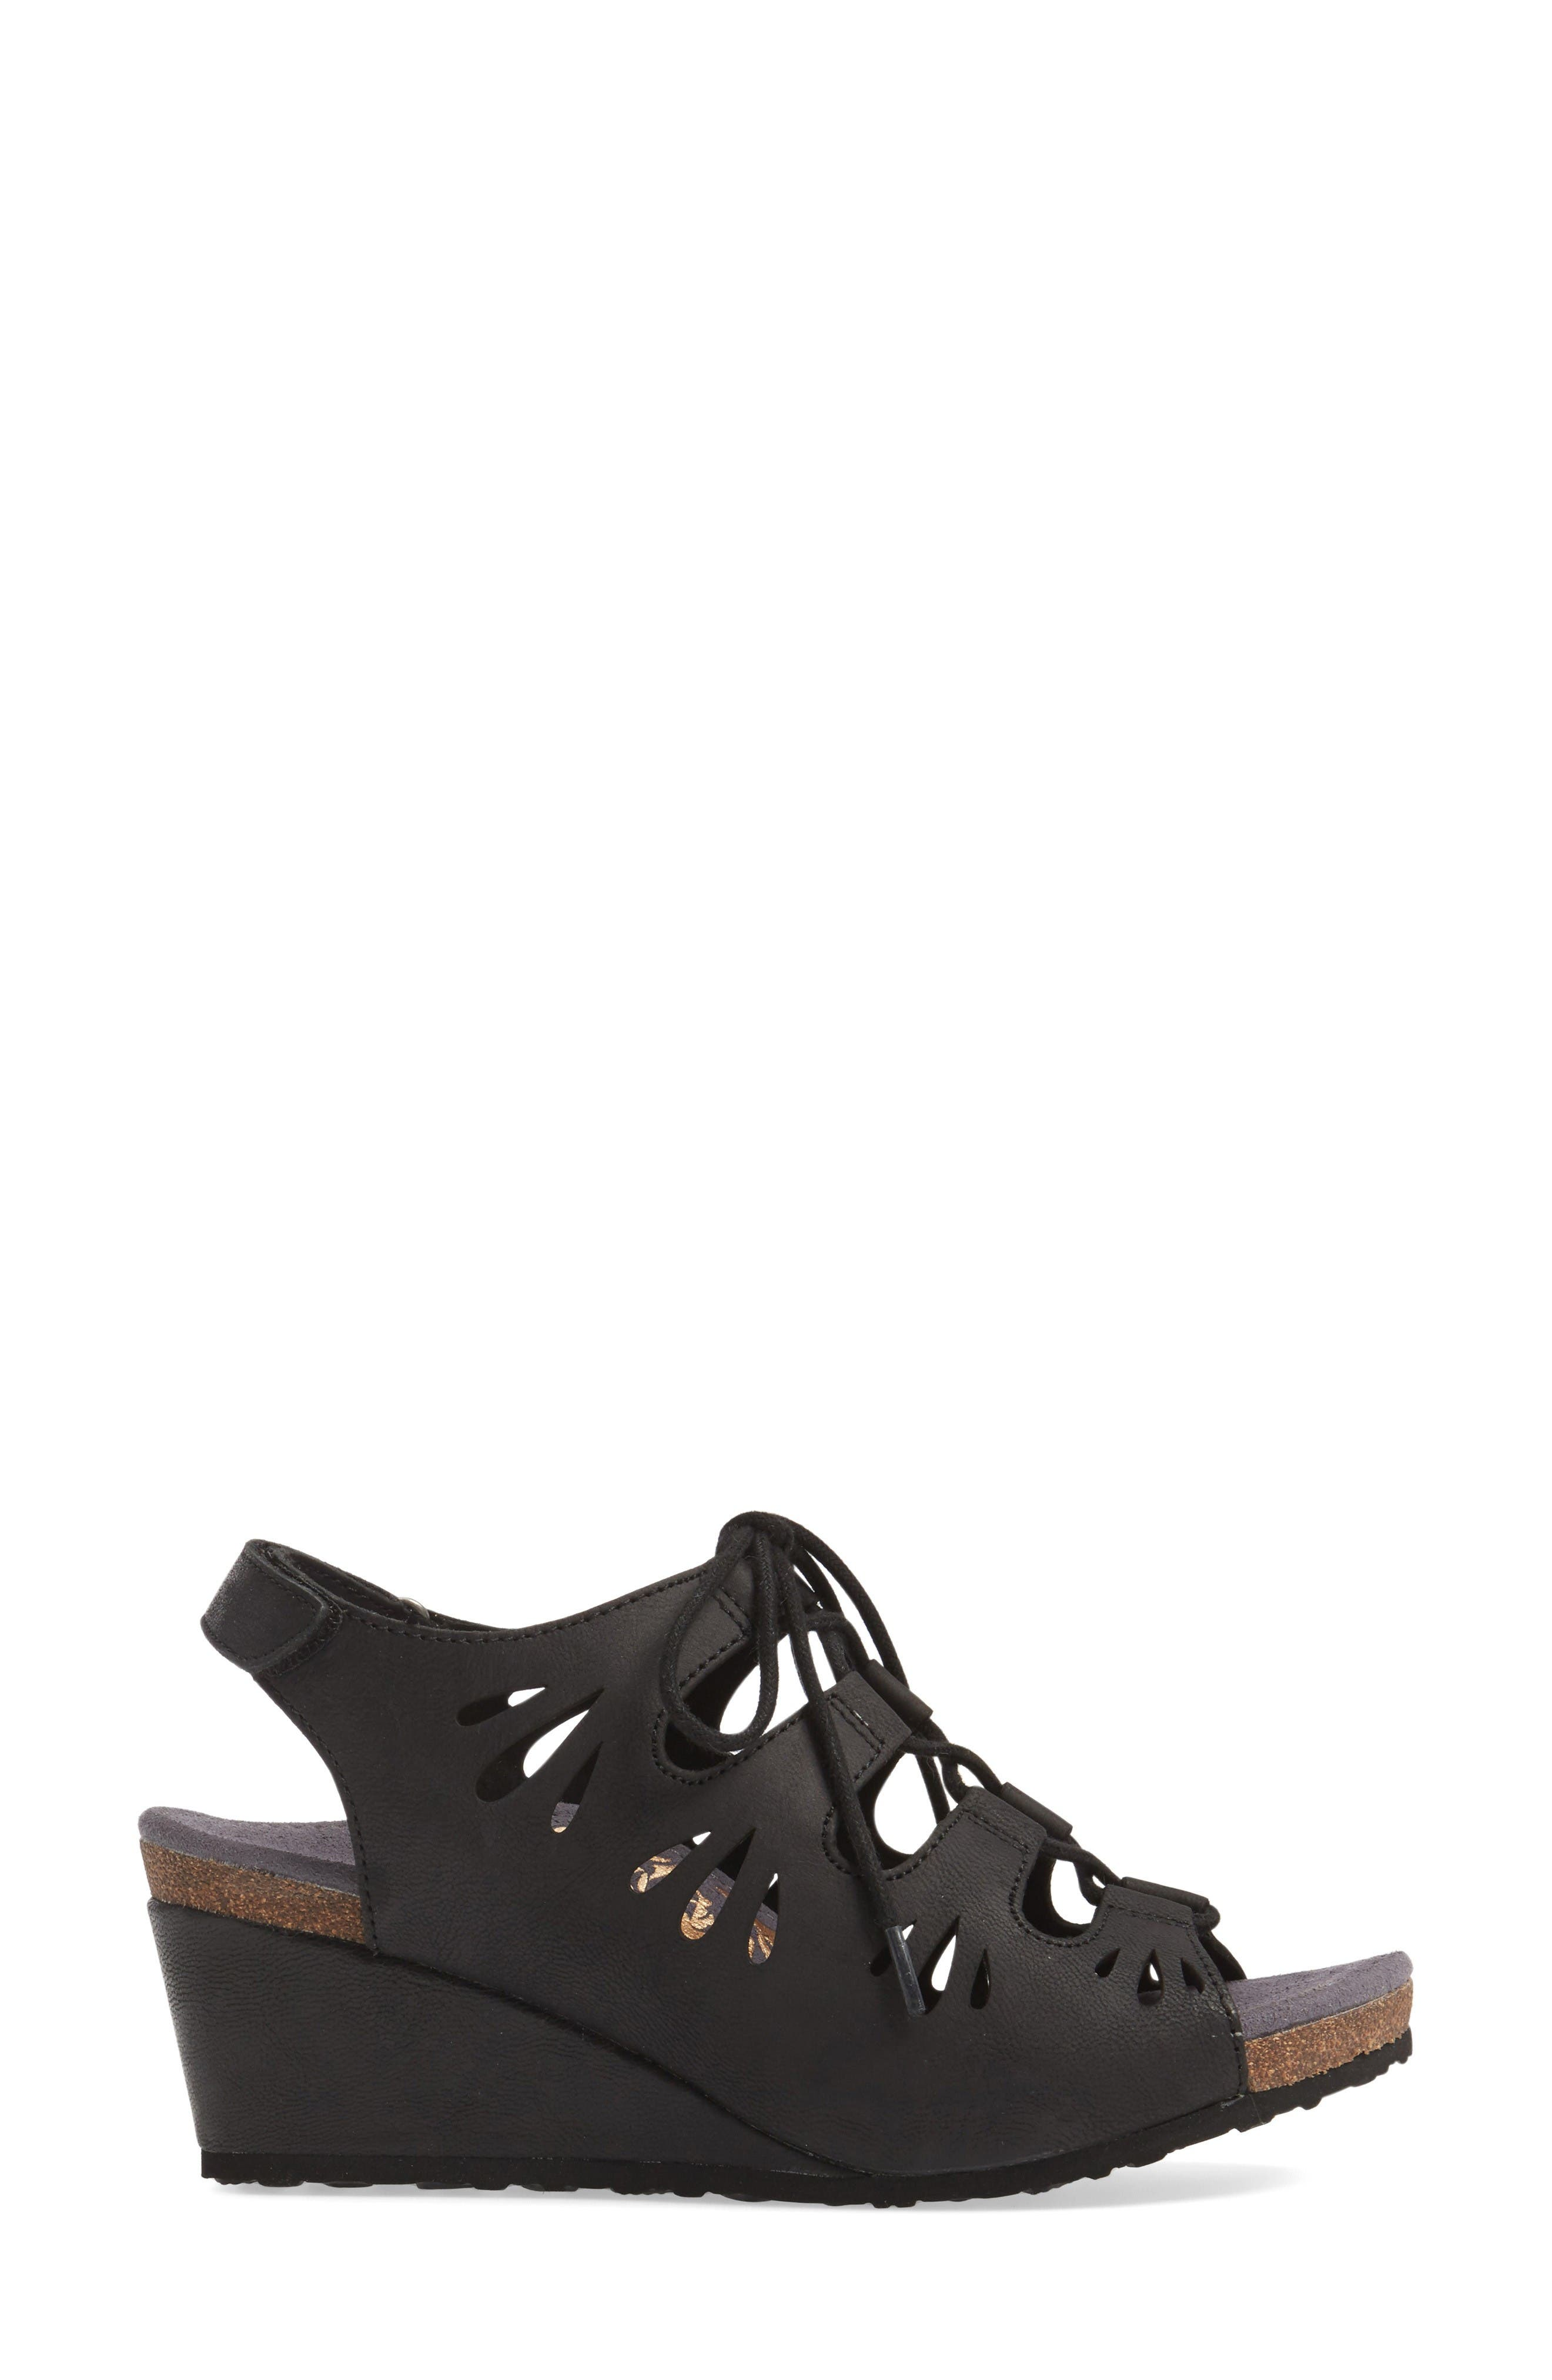 Giselle Slingback Wedge Sandal,                             Alternate thumbnail 3, color,                             Black Leather